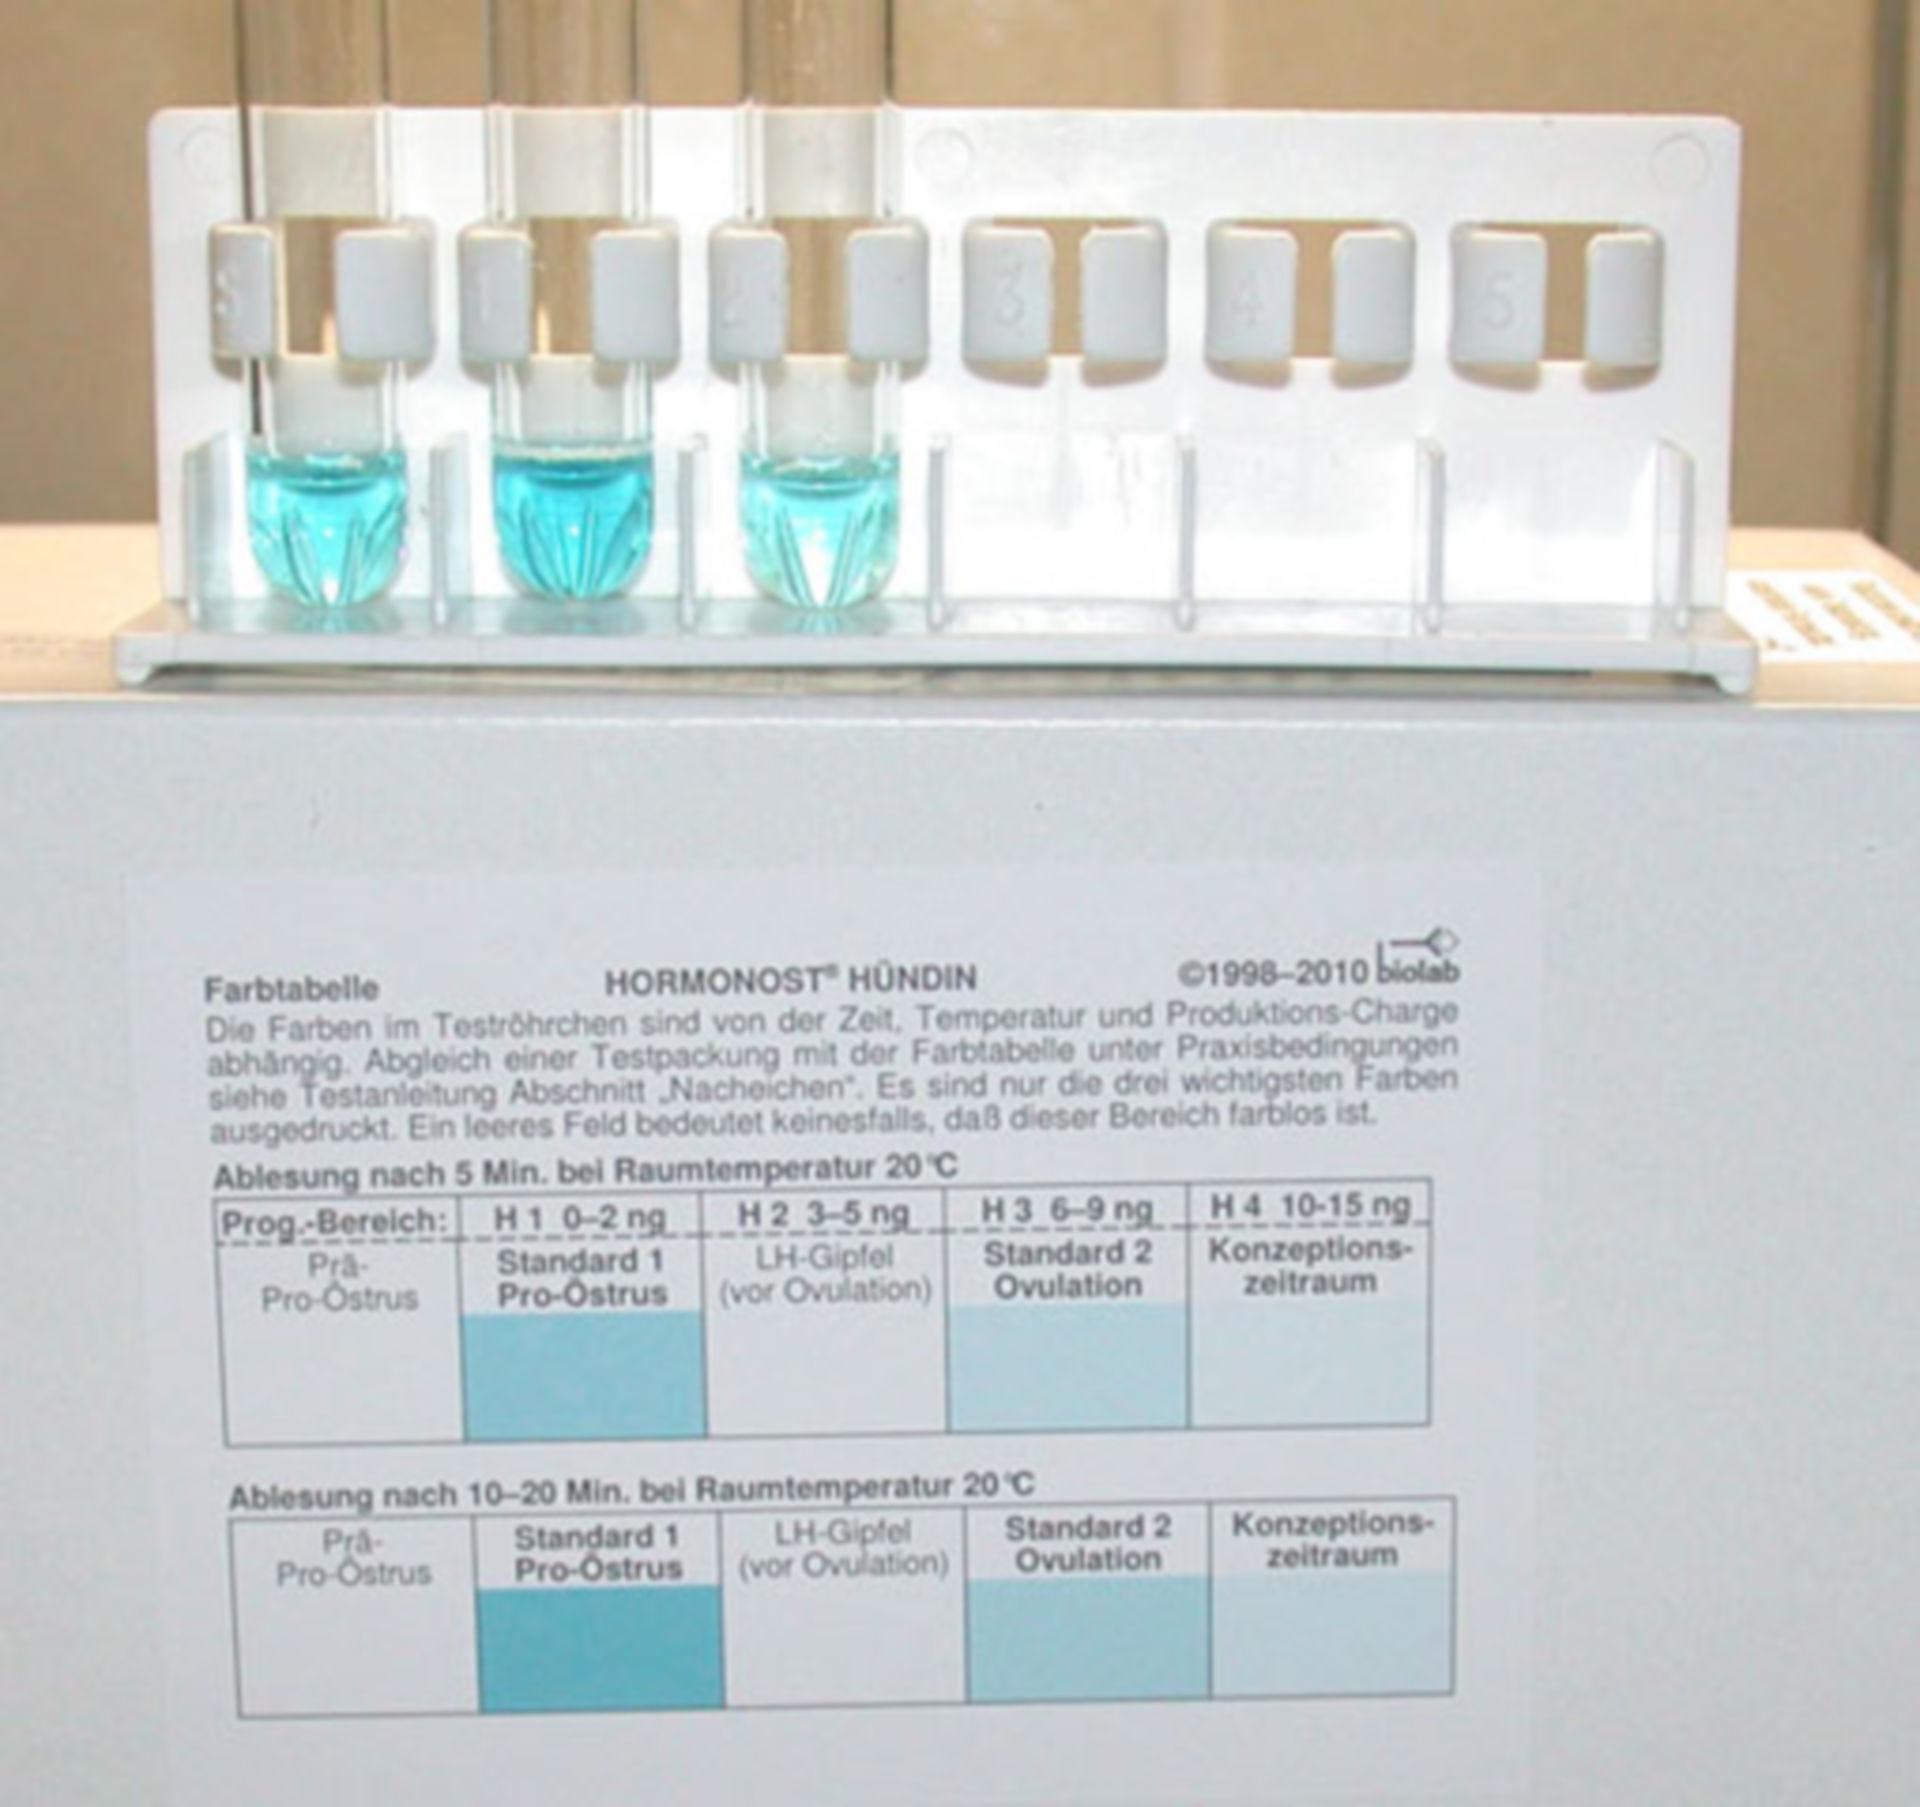 Progesterone test